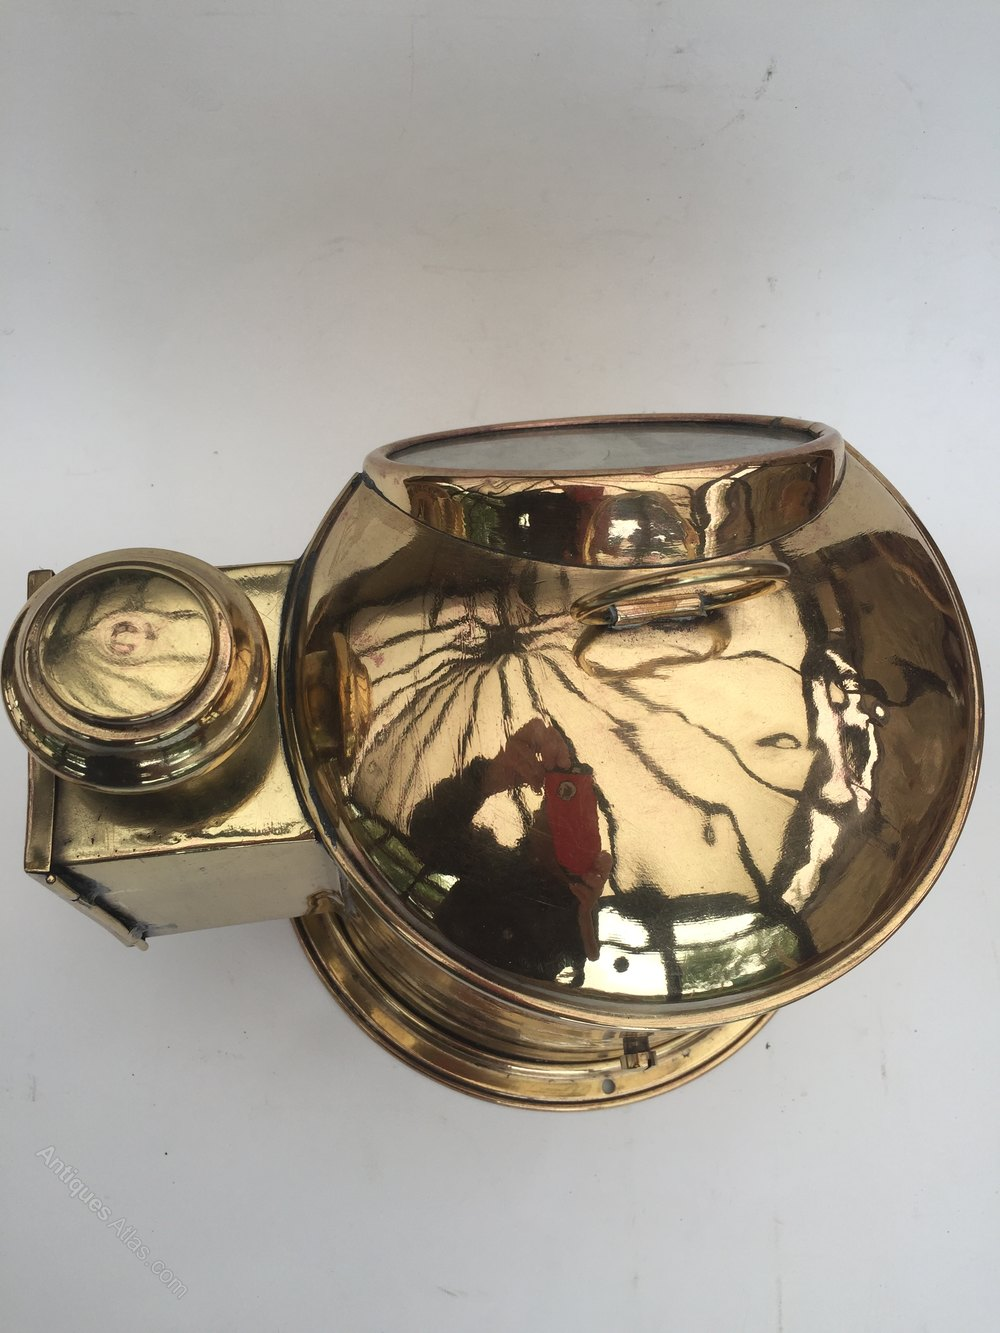 Brass Nautical Ship Compass Antique Gimbal Marine Binnacle